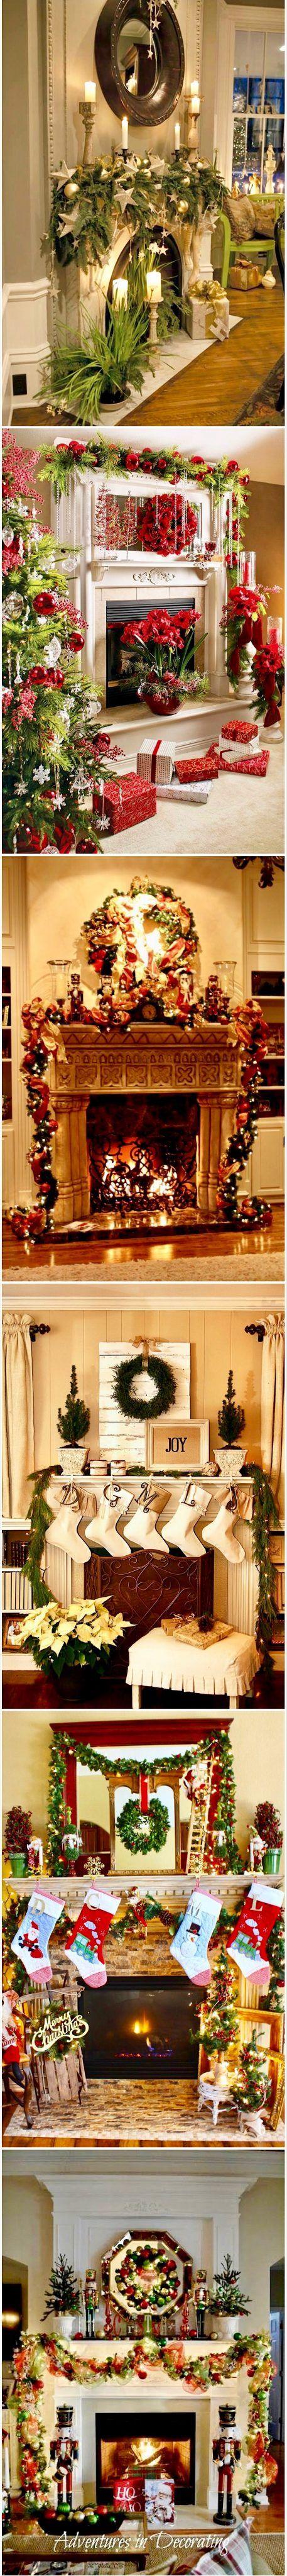 Christmas Mantel Decorating Ideas | deko | Pinterest | Dekoration ...